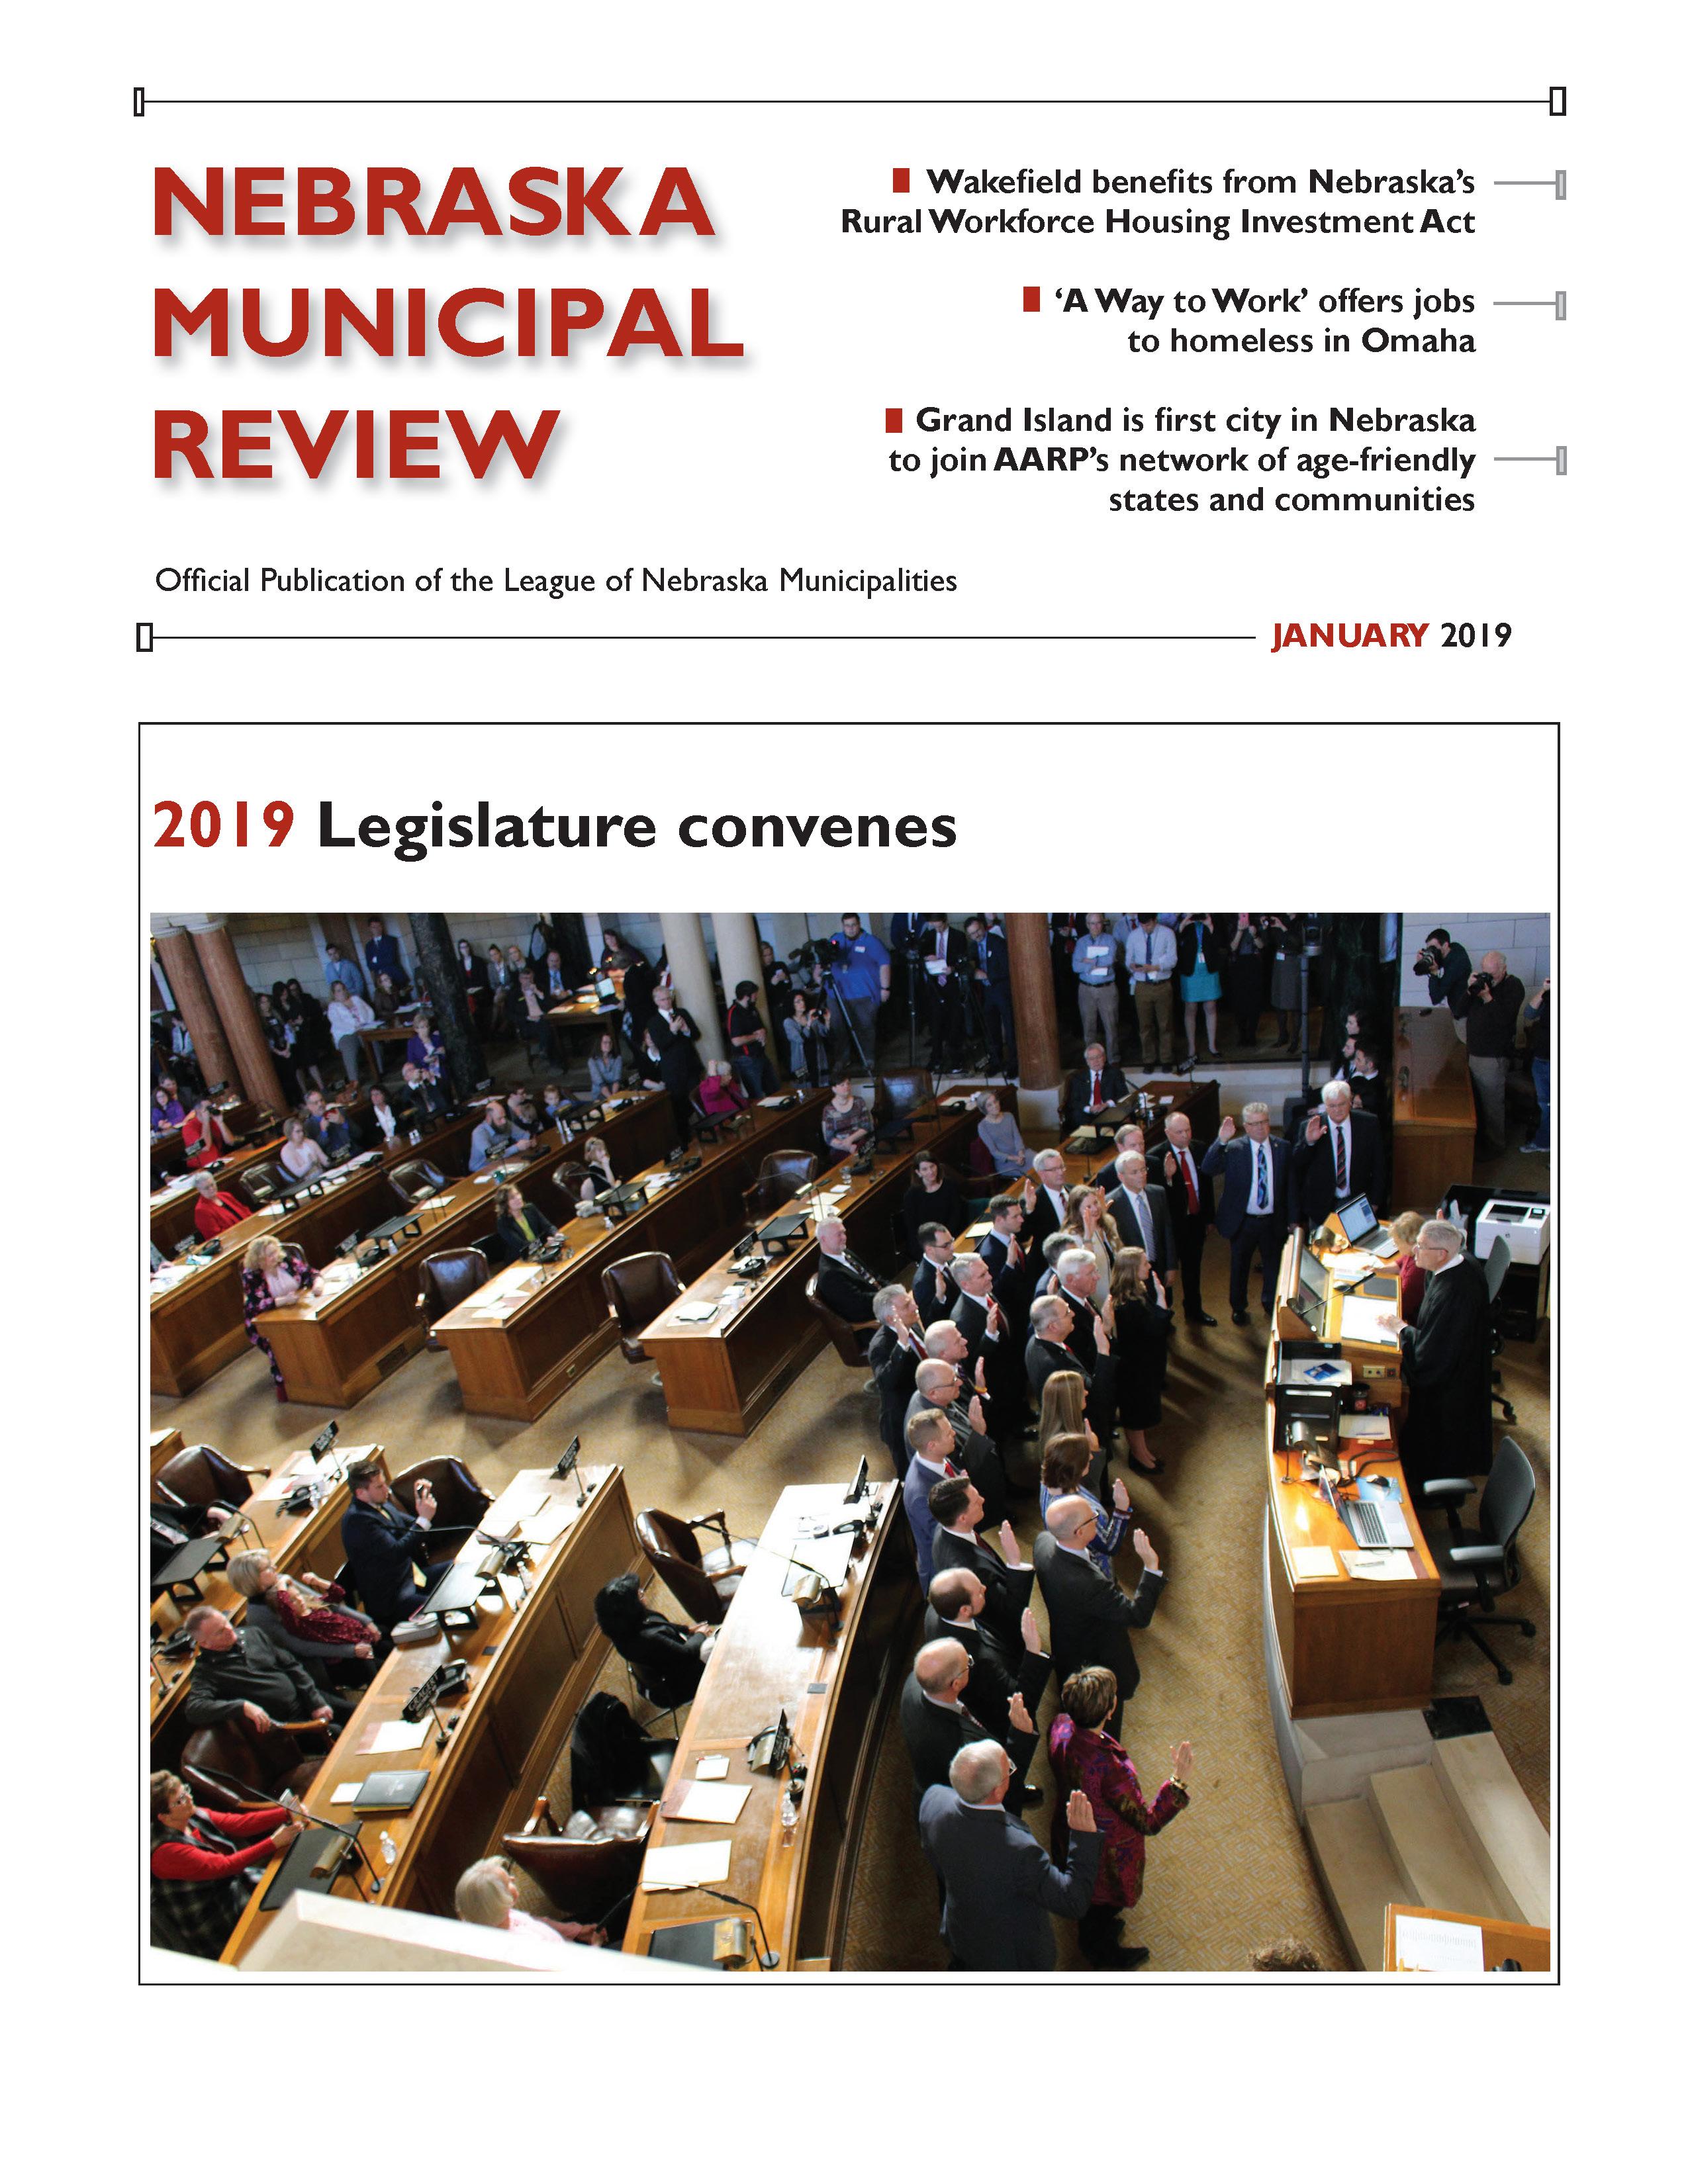 Nebraska Municipal Review